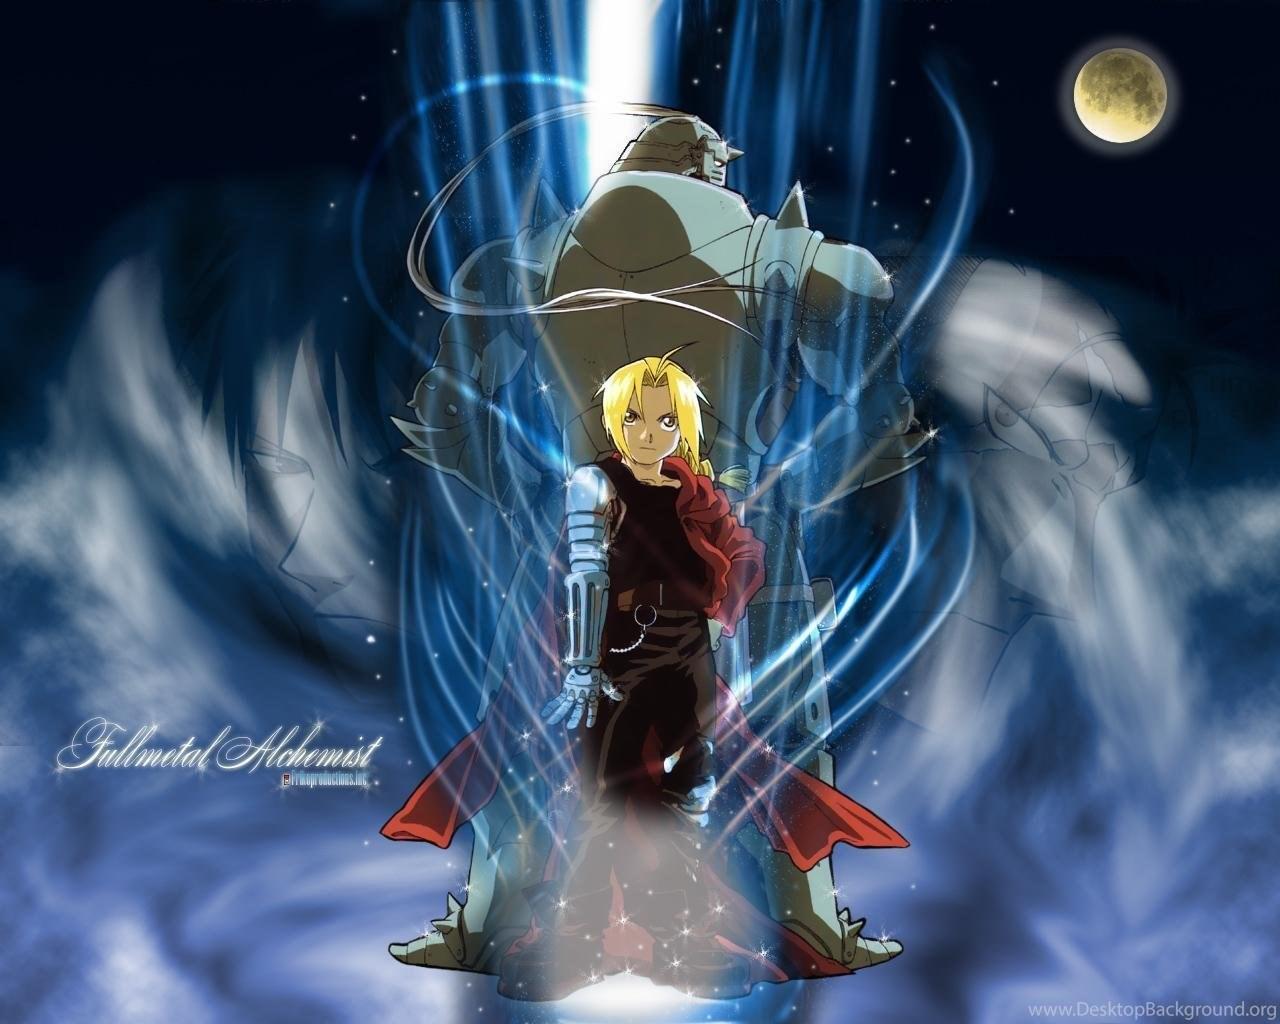 Brotherhood Elric Alphonse Fullmetal Alchemist May Chang